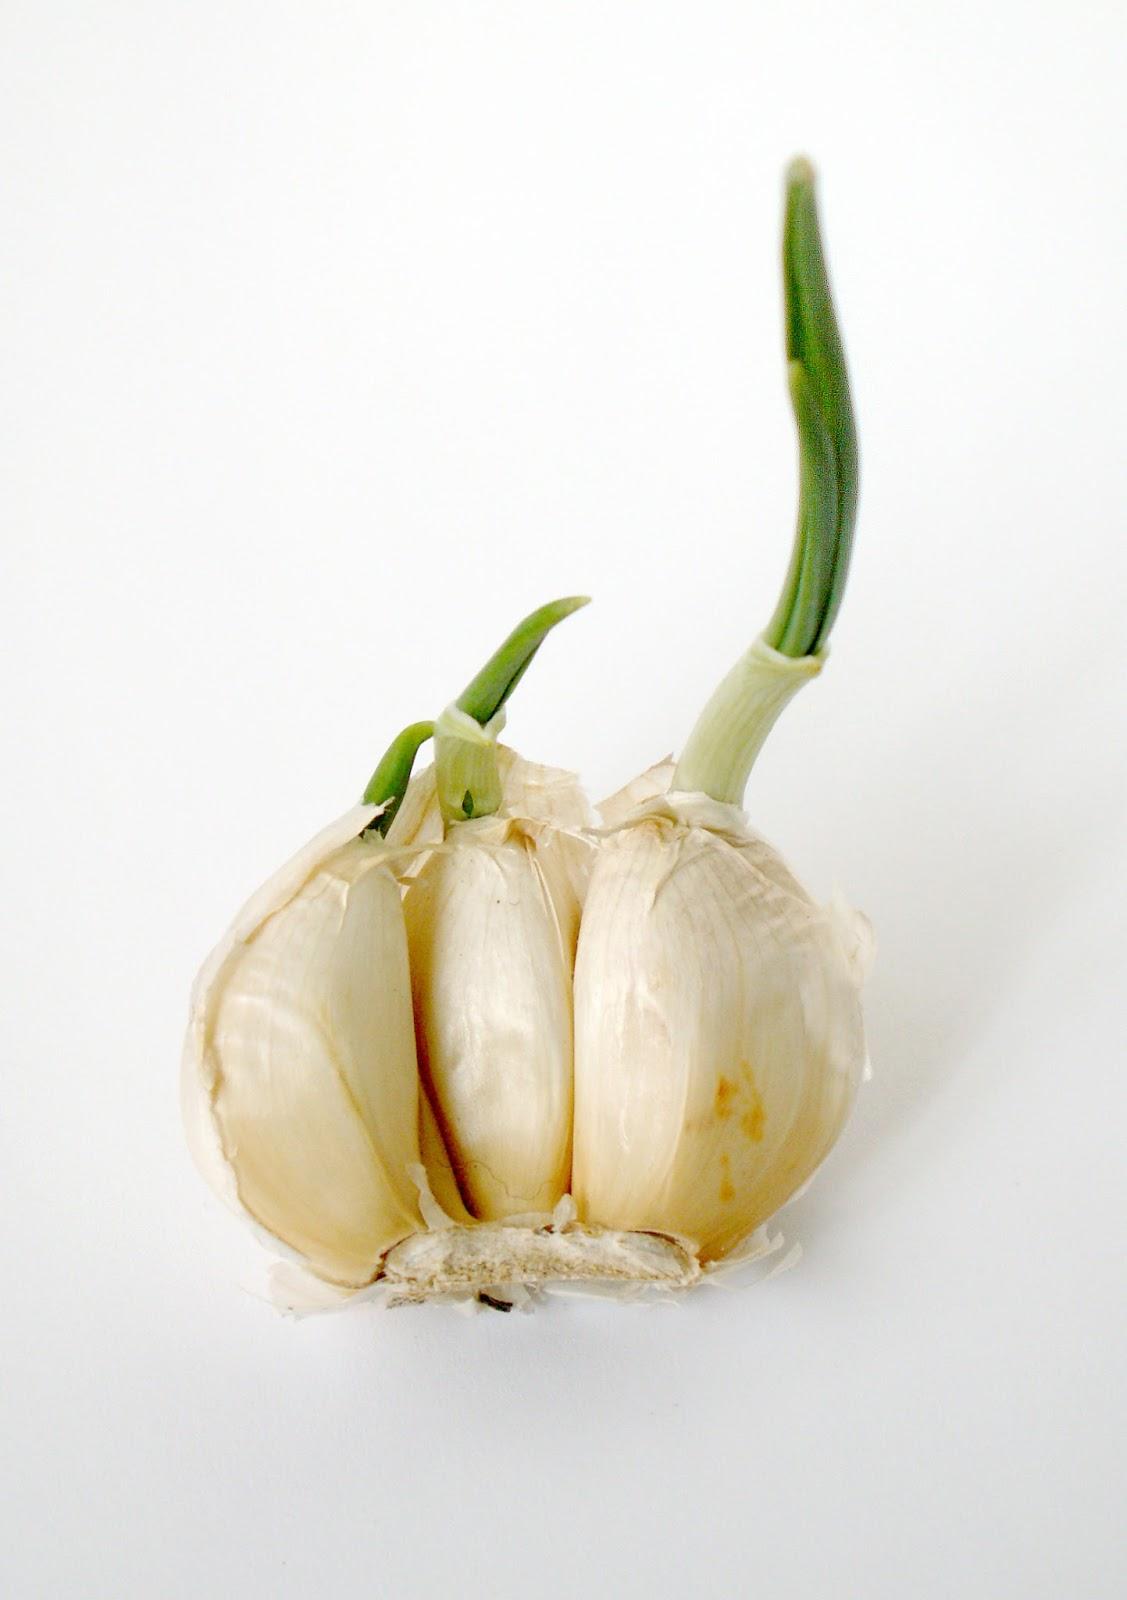 Wallpaper: Amazing Health Benefit of Garlic